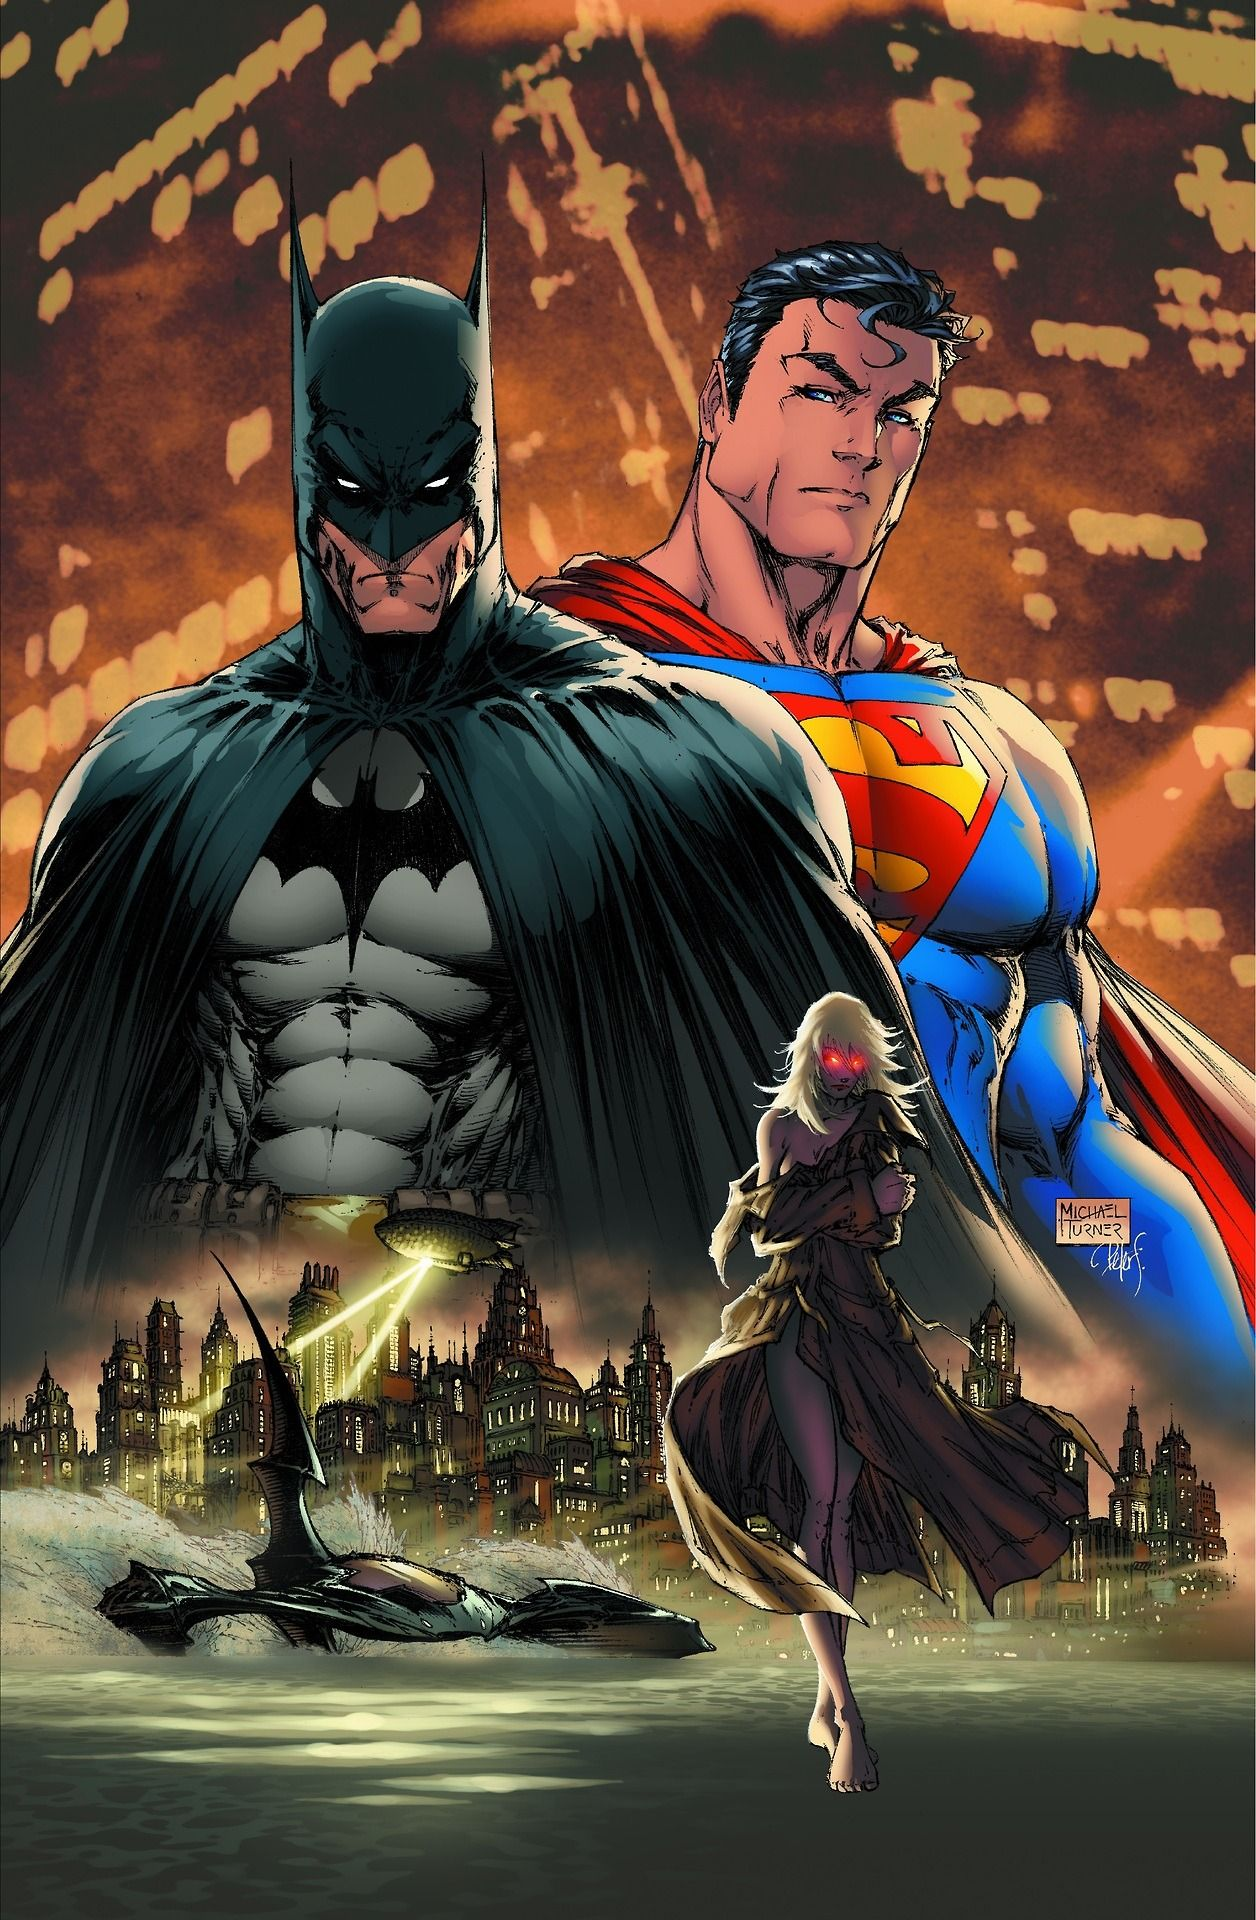 Superman Batman Vol 1 8 Cover Art By Michael Turner Superman Art Batman And Superman Batman